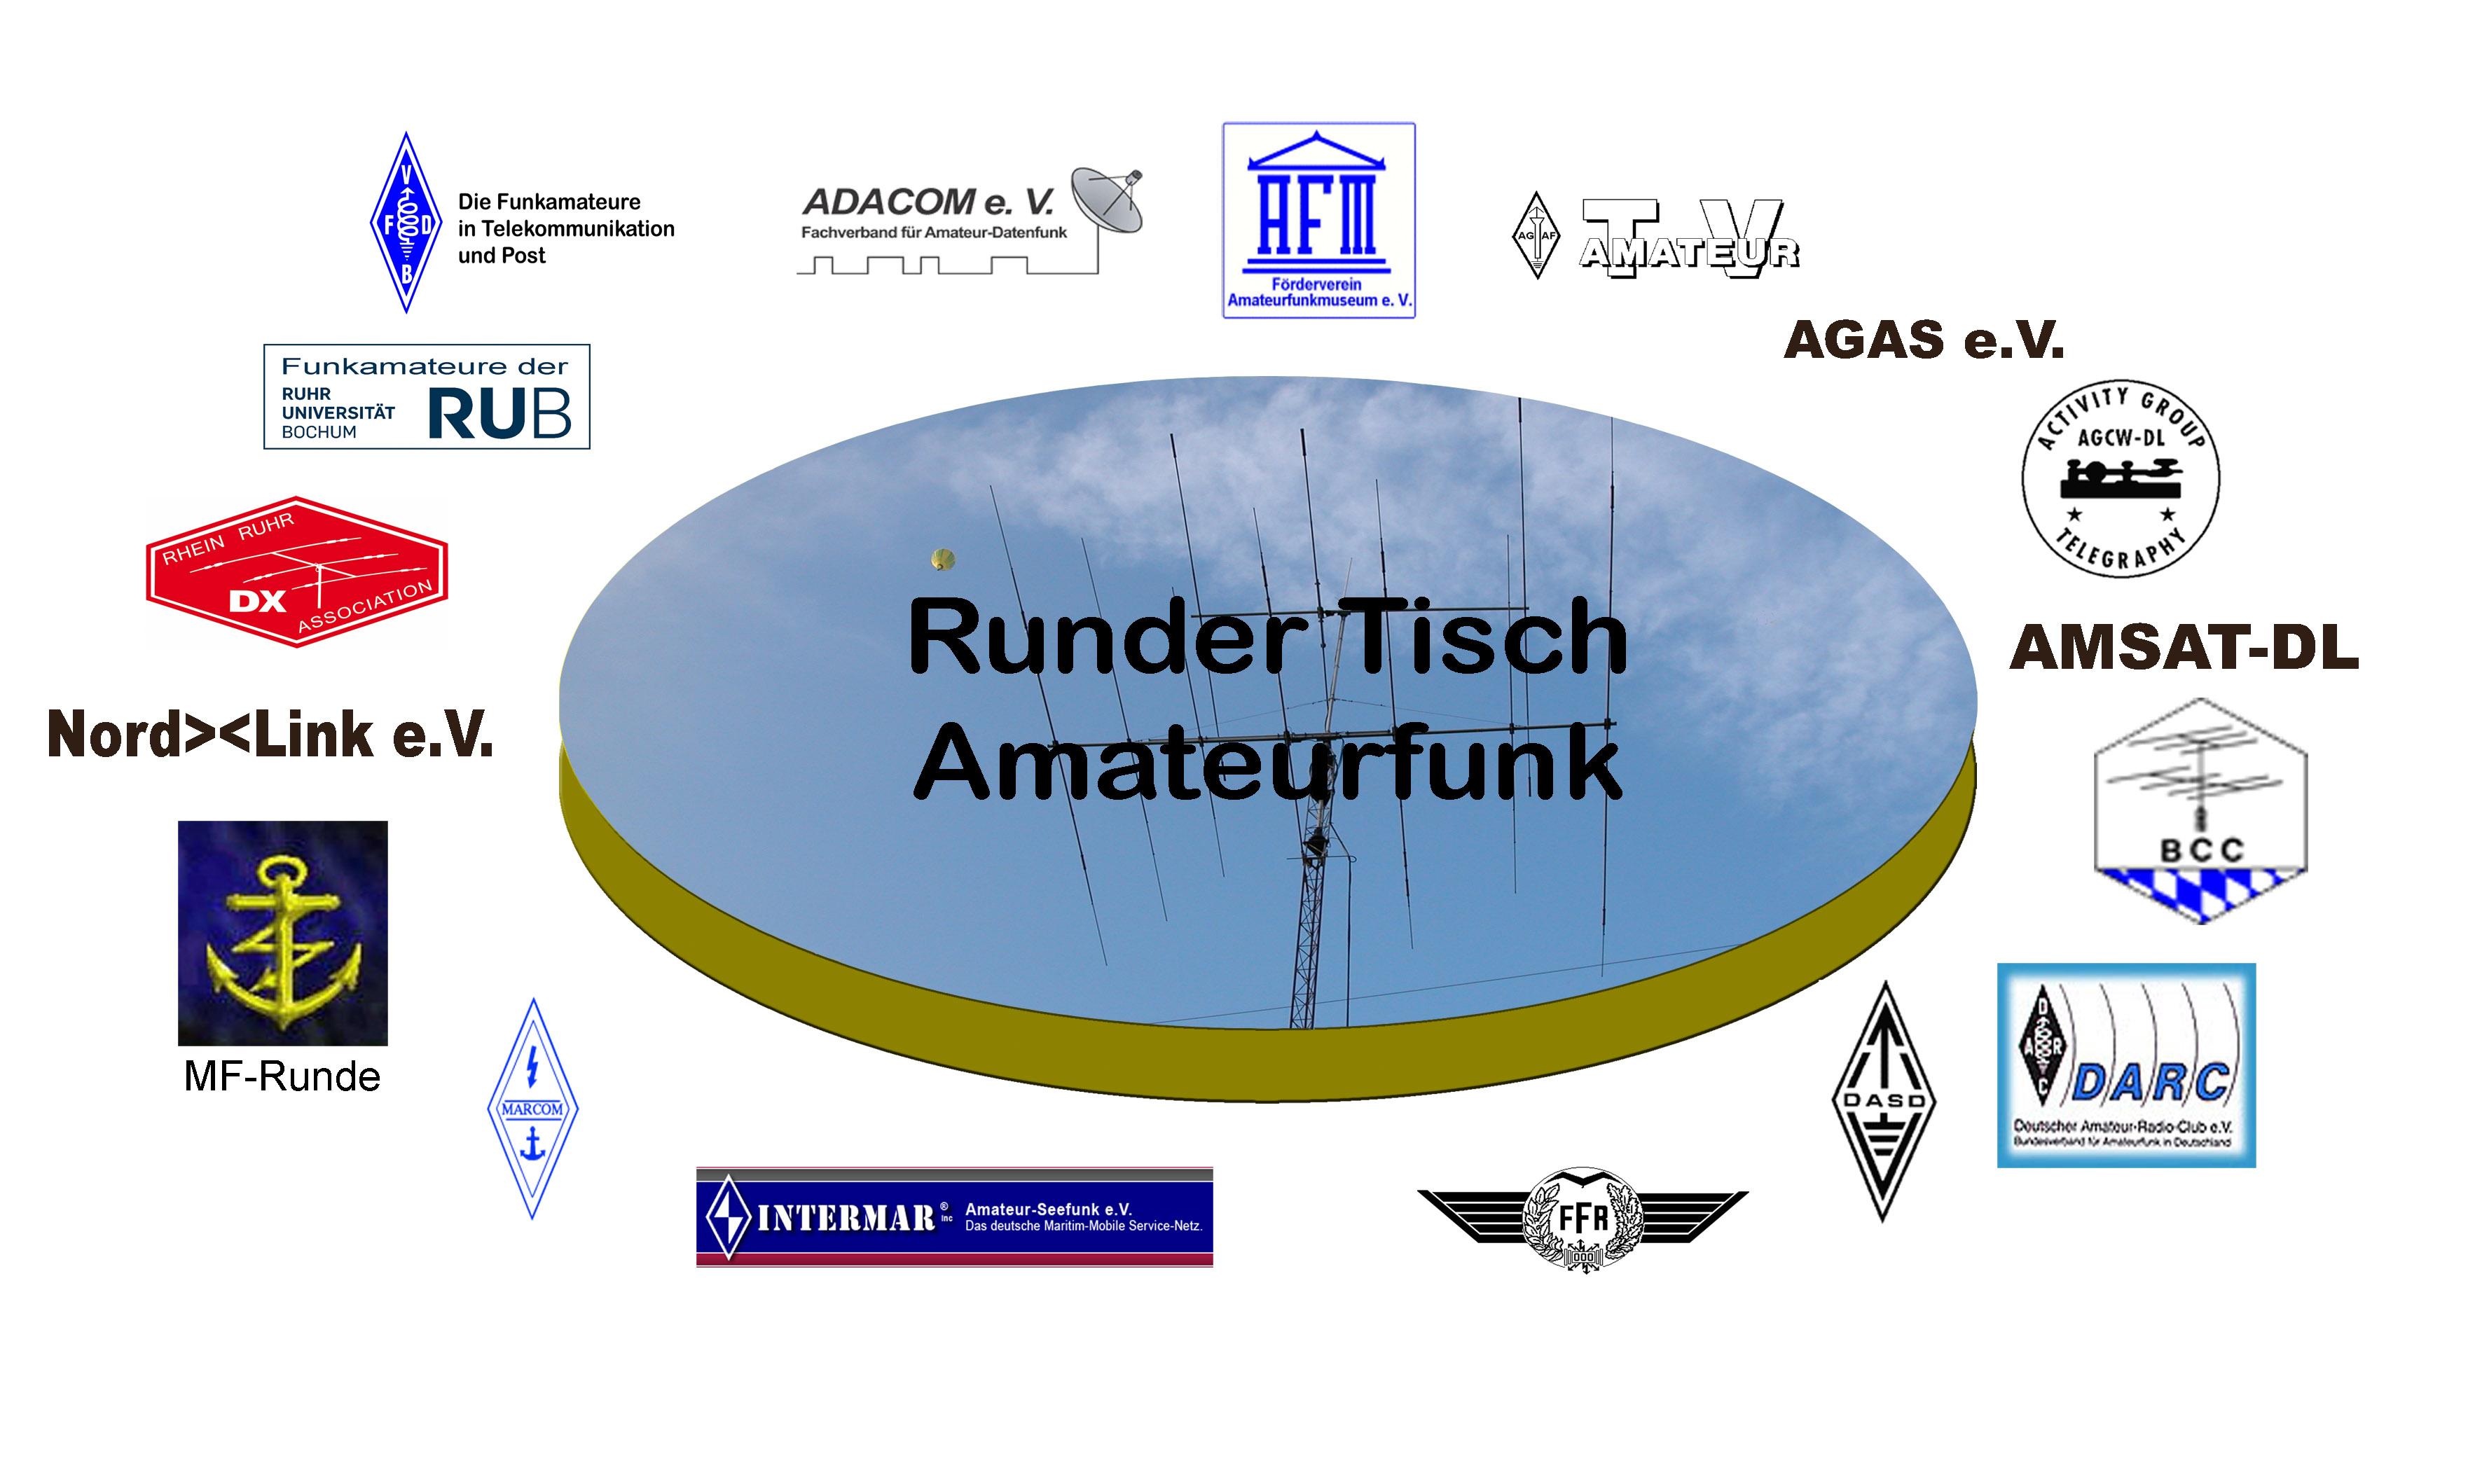 rta_2_antenne.jpg - 755203 Bytes